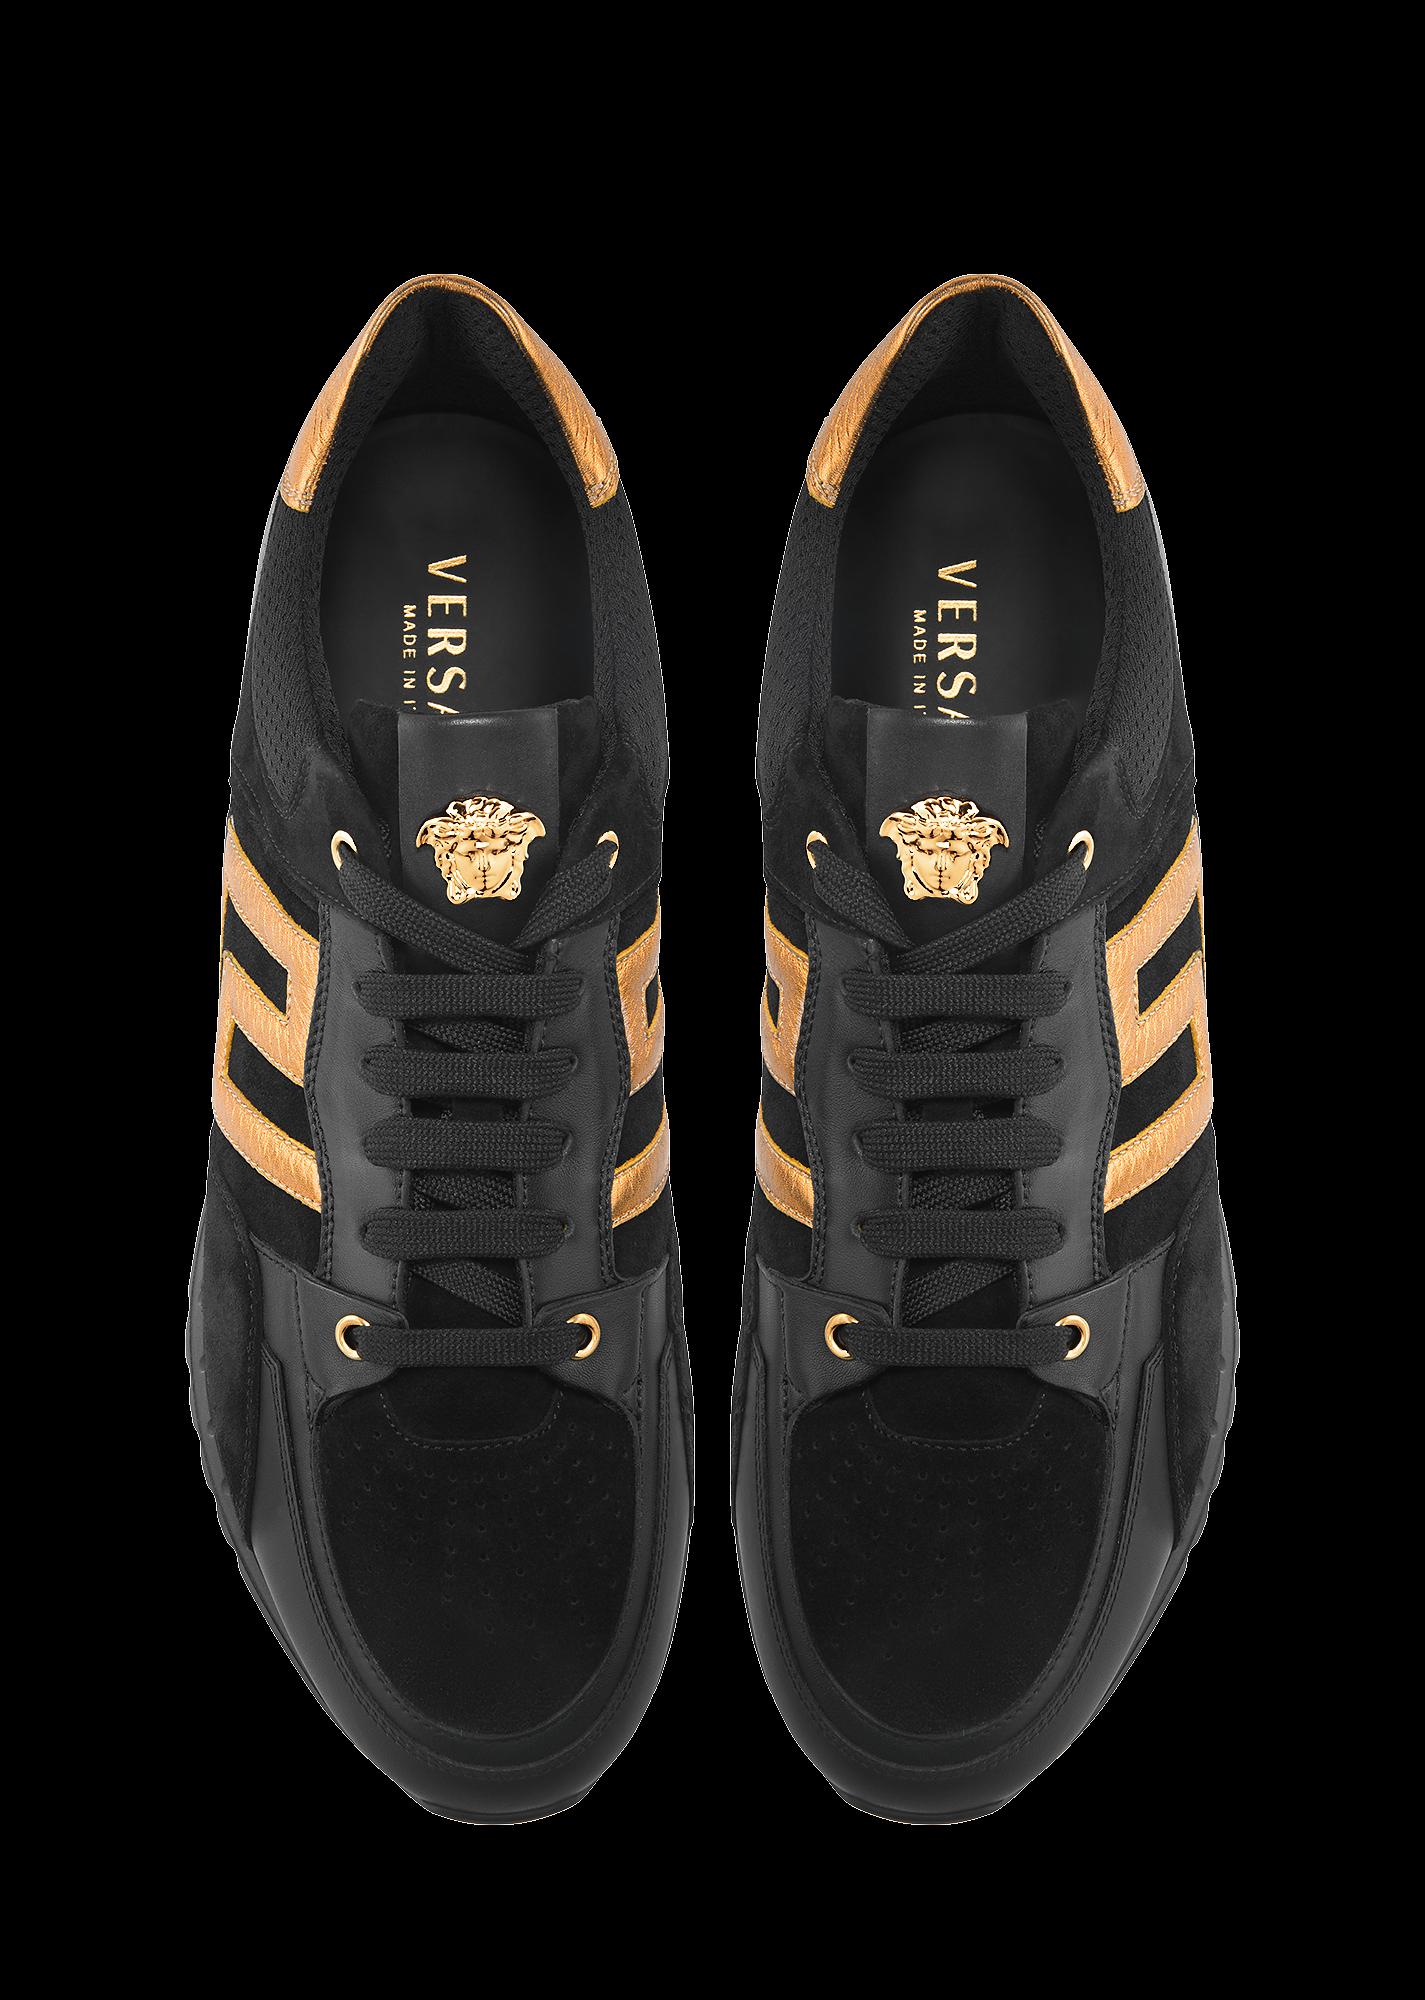 quality design aeba5 08fe9 Versace GREEK KEY RUNNING SHOE for Men   Official Website